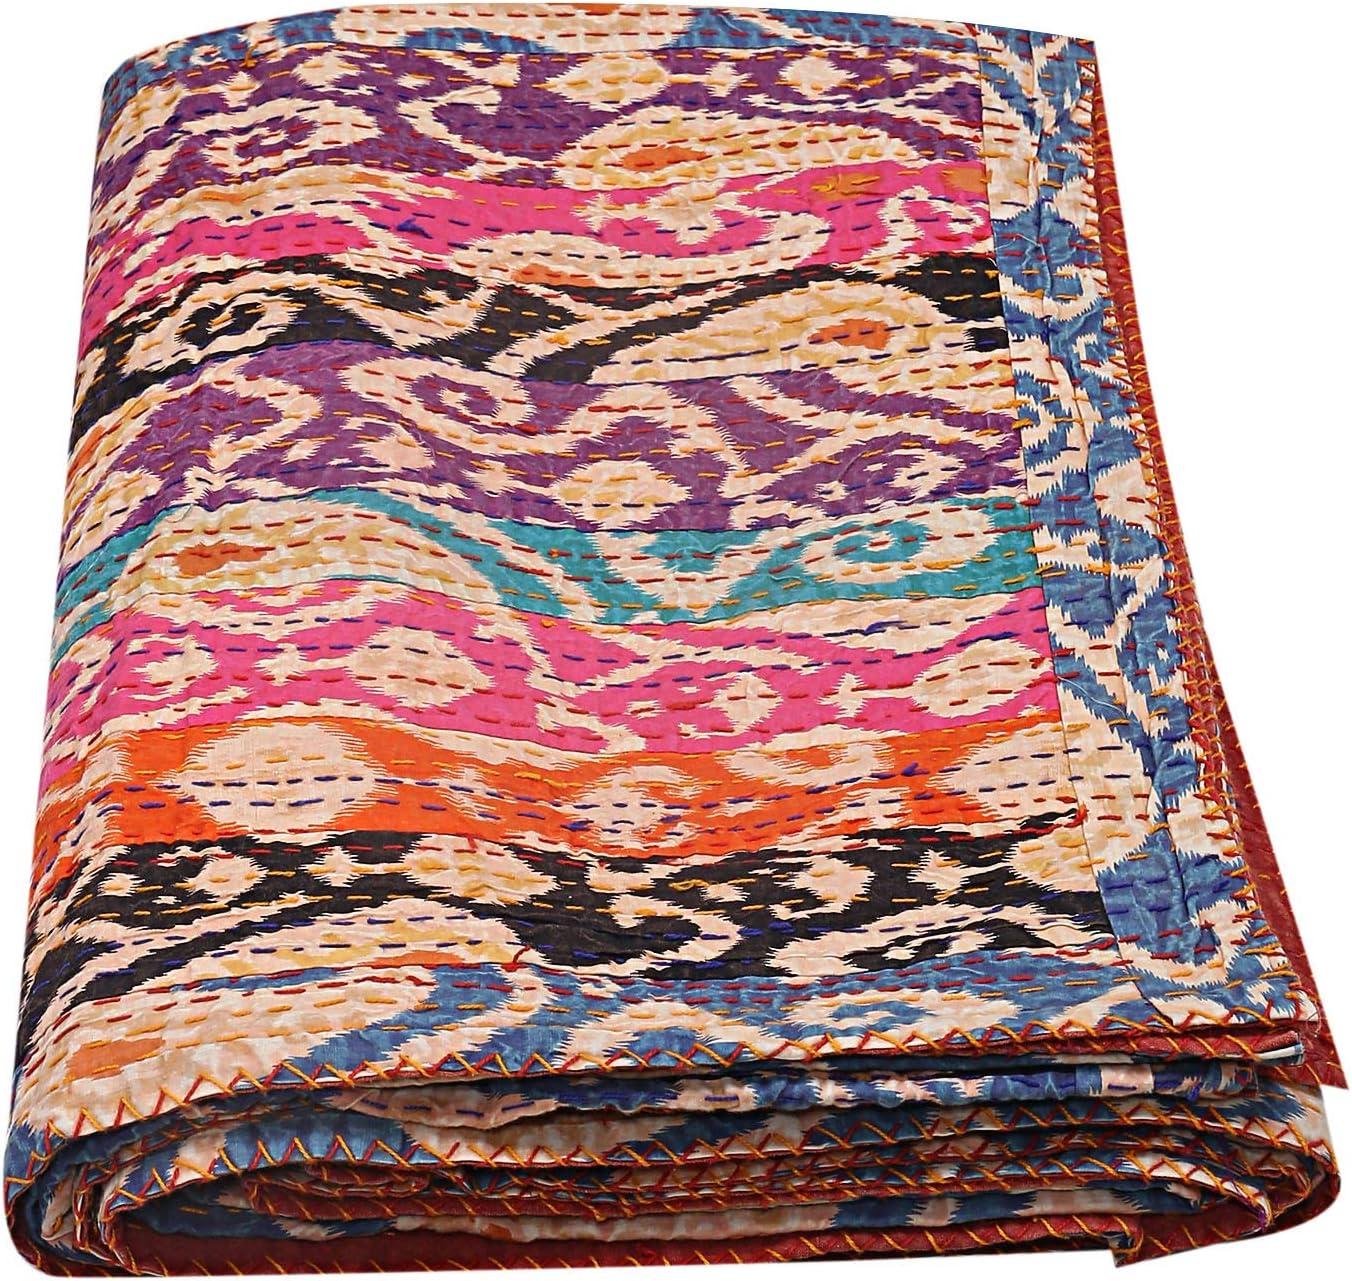 Janki Creation Ikat 賜物 Print Multi 贈答 Kantha Bedspread Indian T Cotton